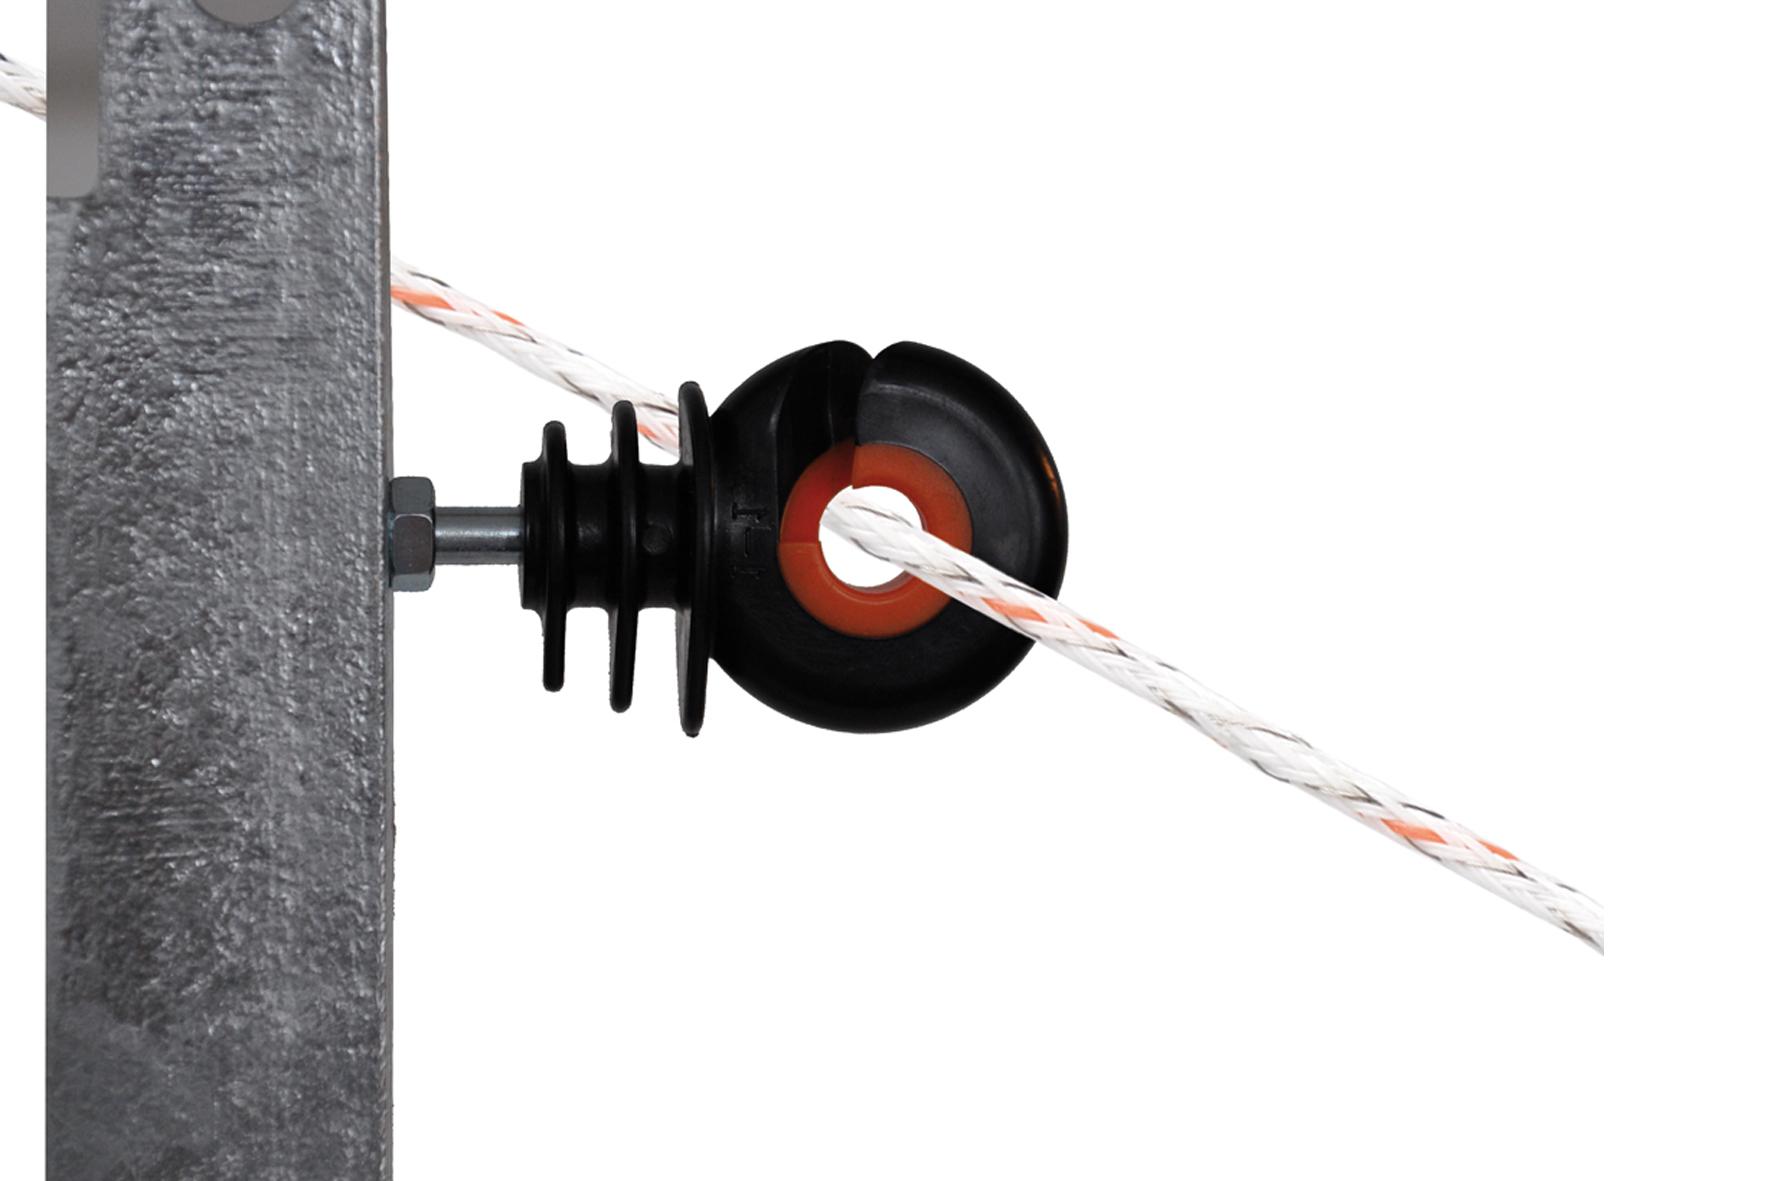 isolateur fer gallagher xdi achat en ligne ou dans notre. Black Bedroom Furniture Sets. Home Design Ideas